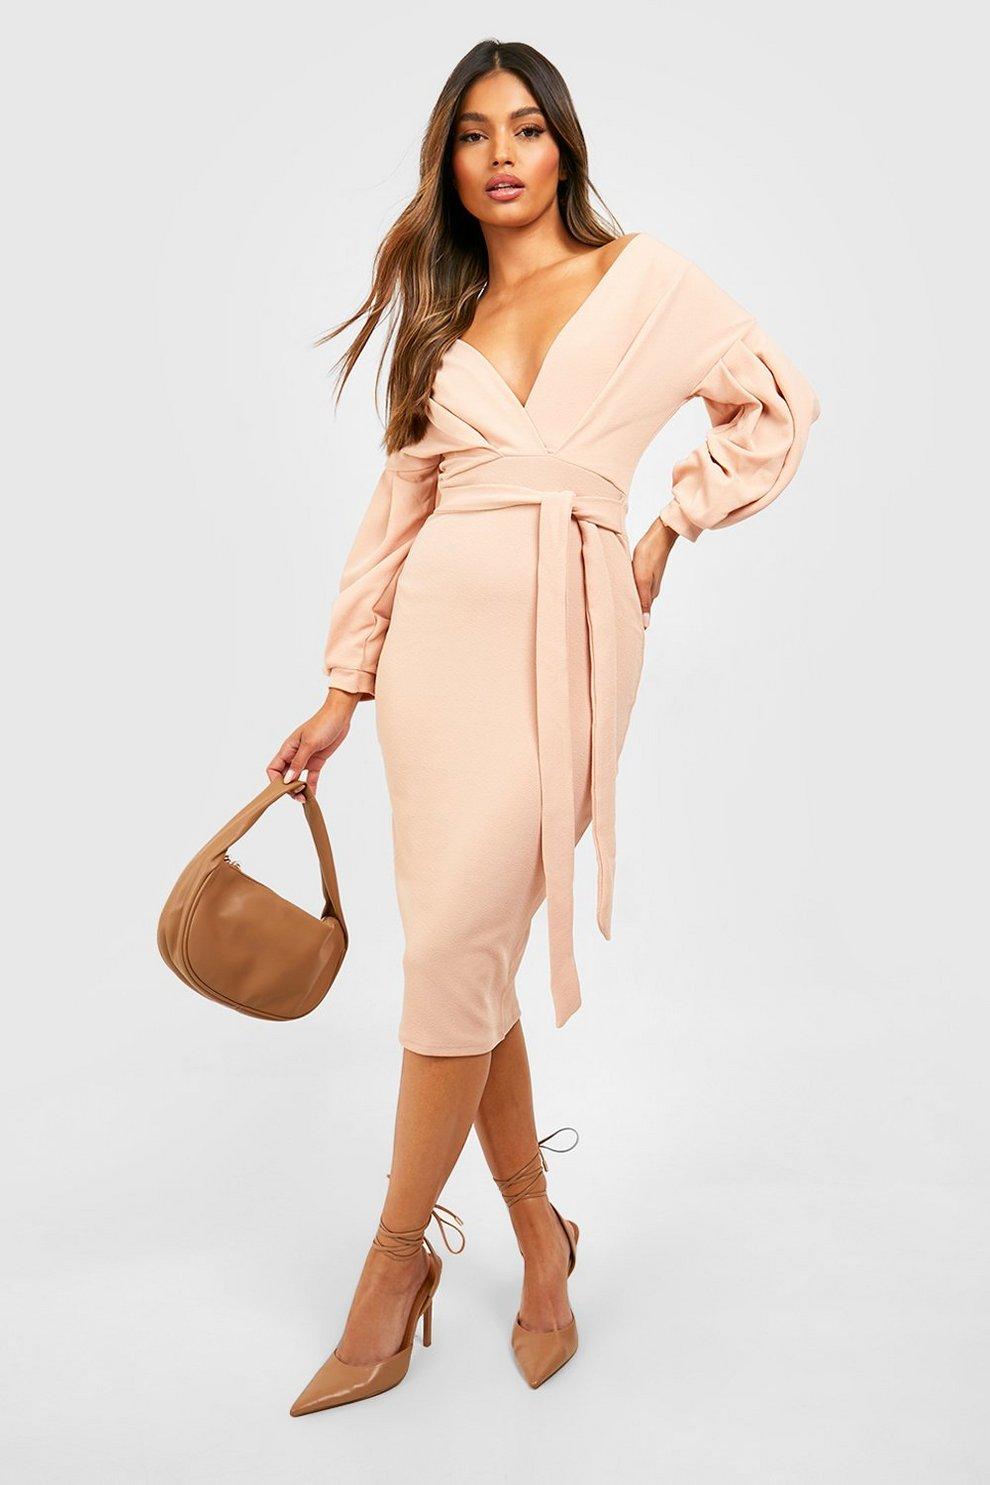 a15940e663a07 Womens Blush Off The Shoulder Wrap Midi Bodycon Dress